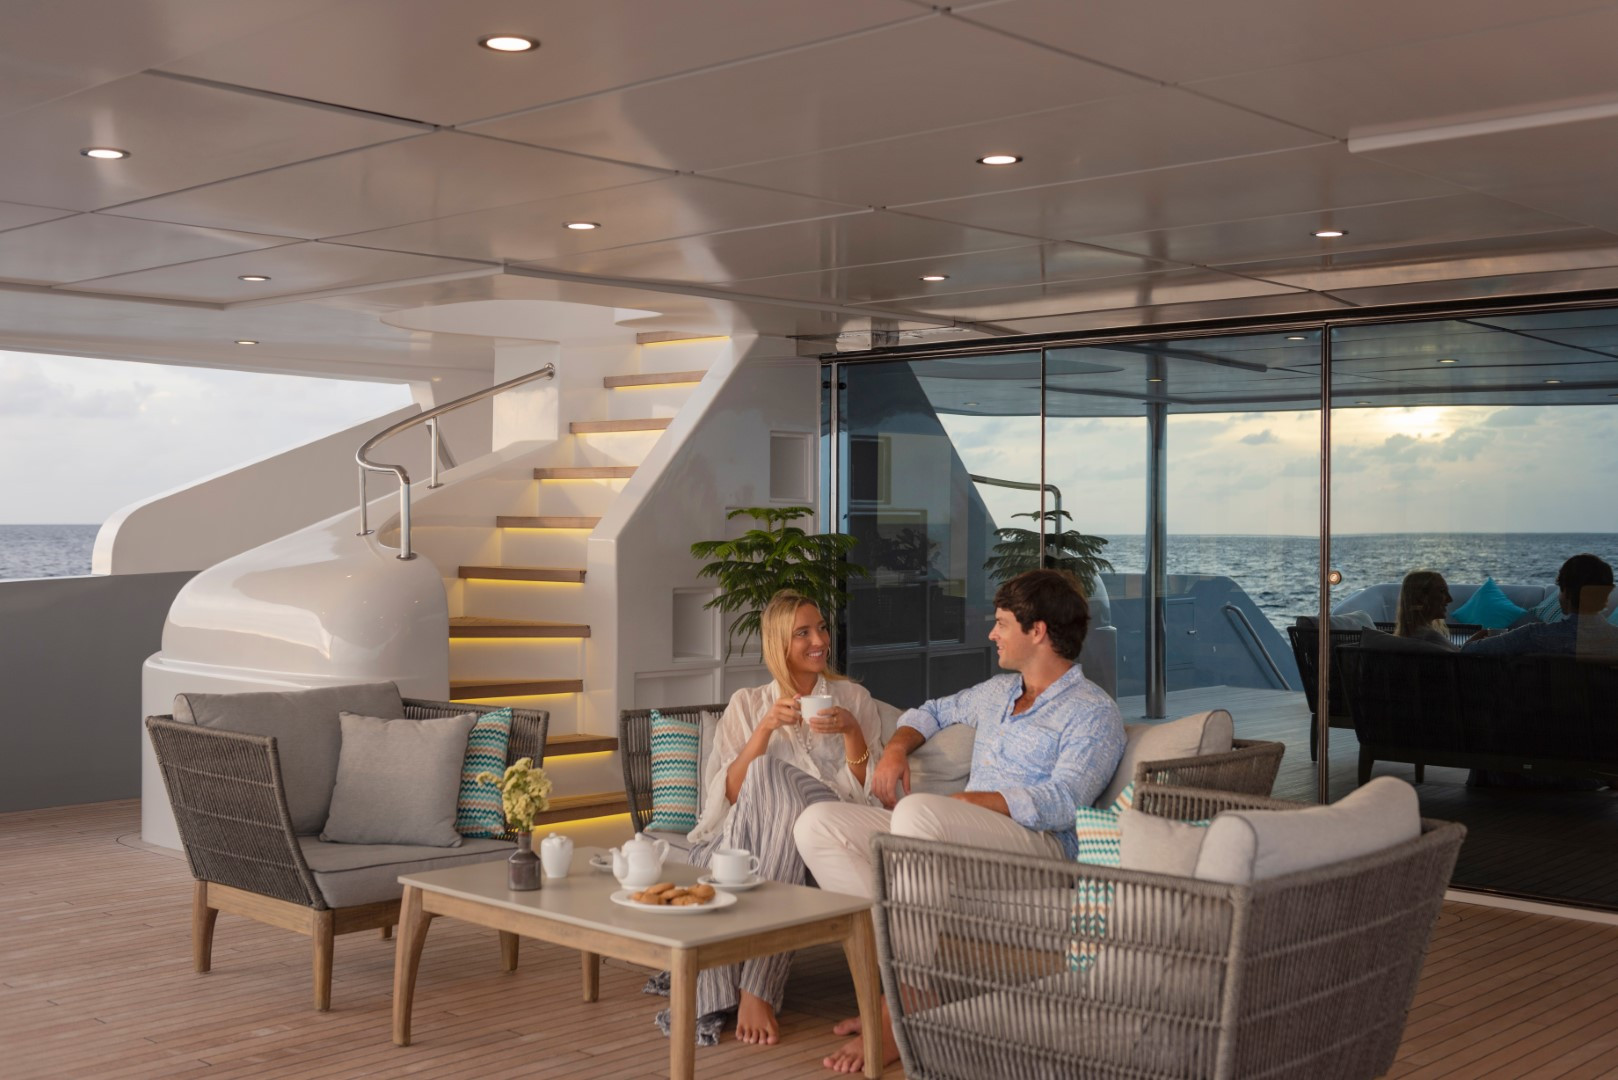 SeaRex_Outdoor Lounge 1 (Large).jpg